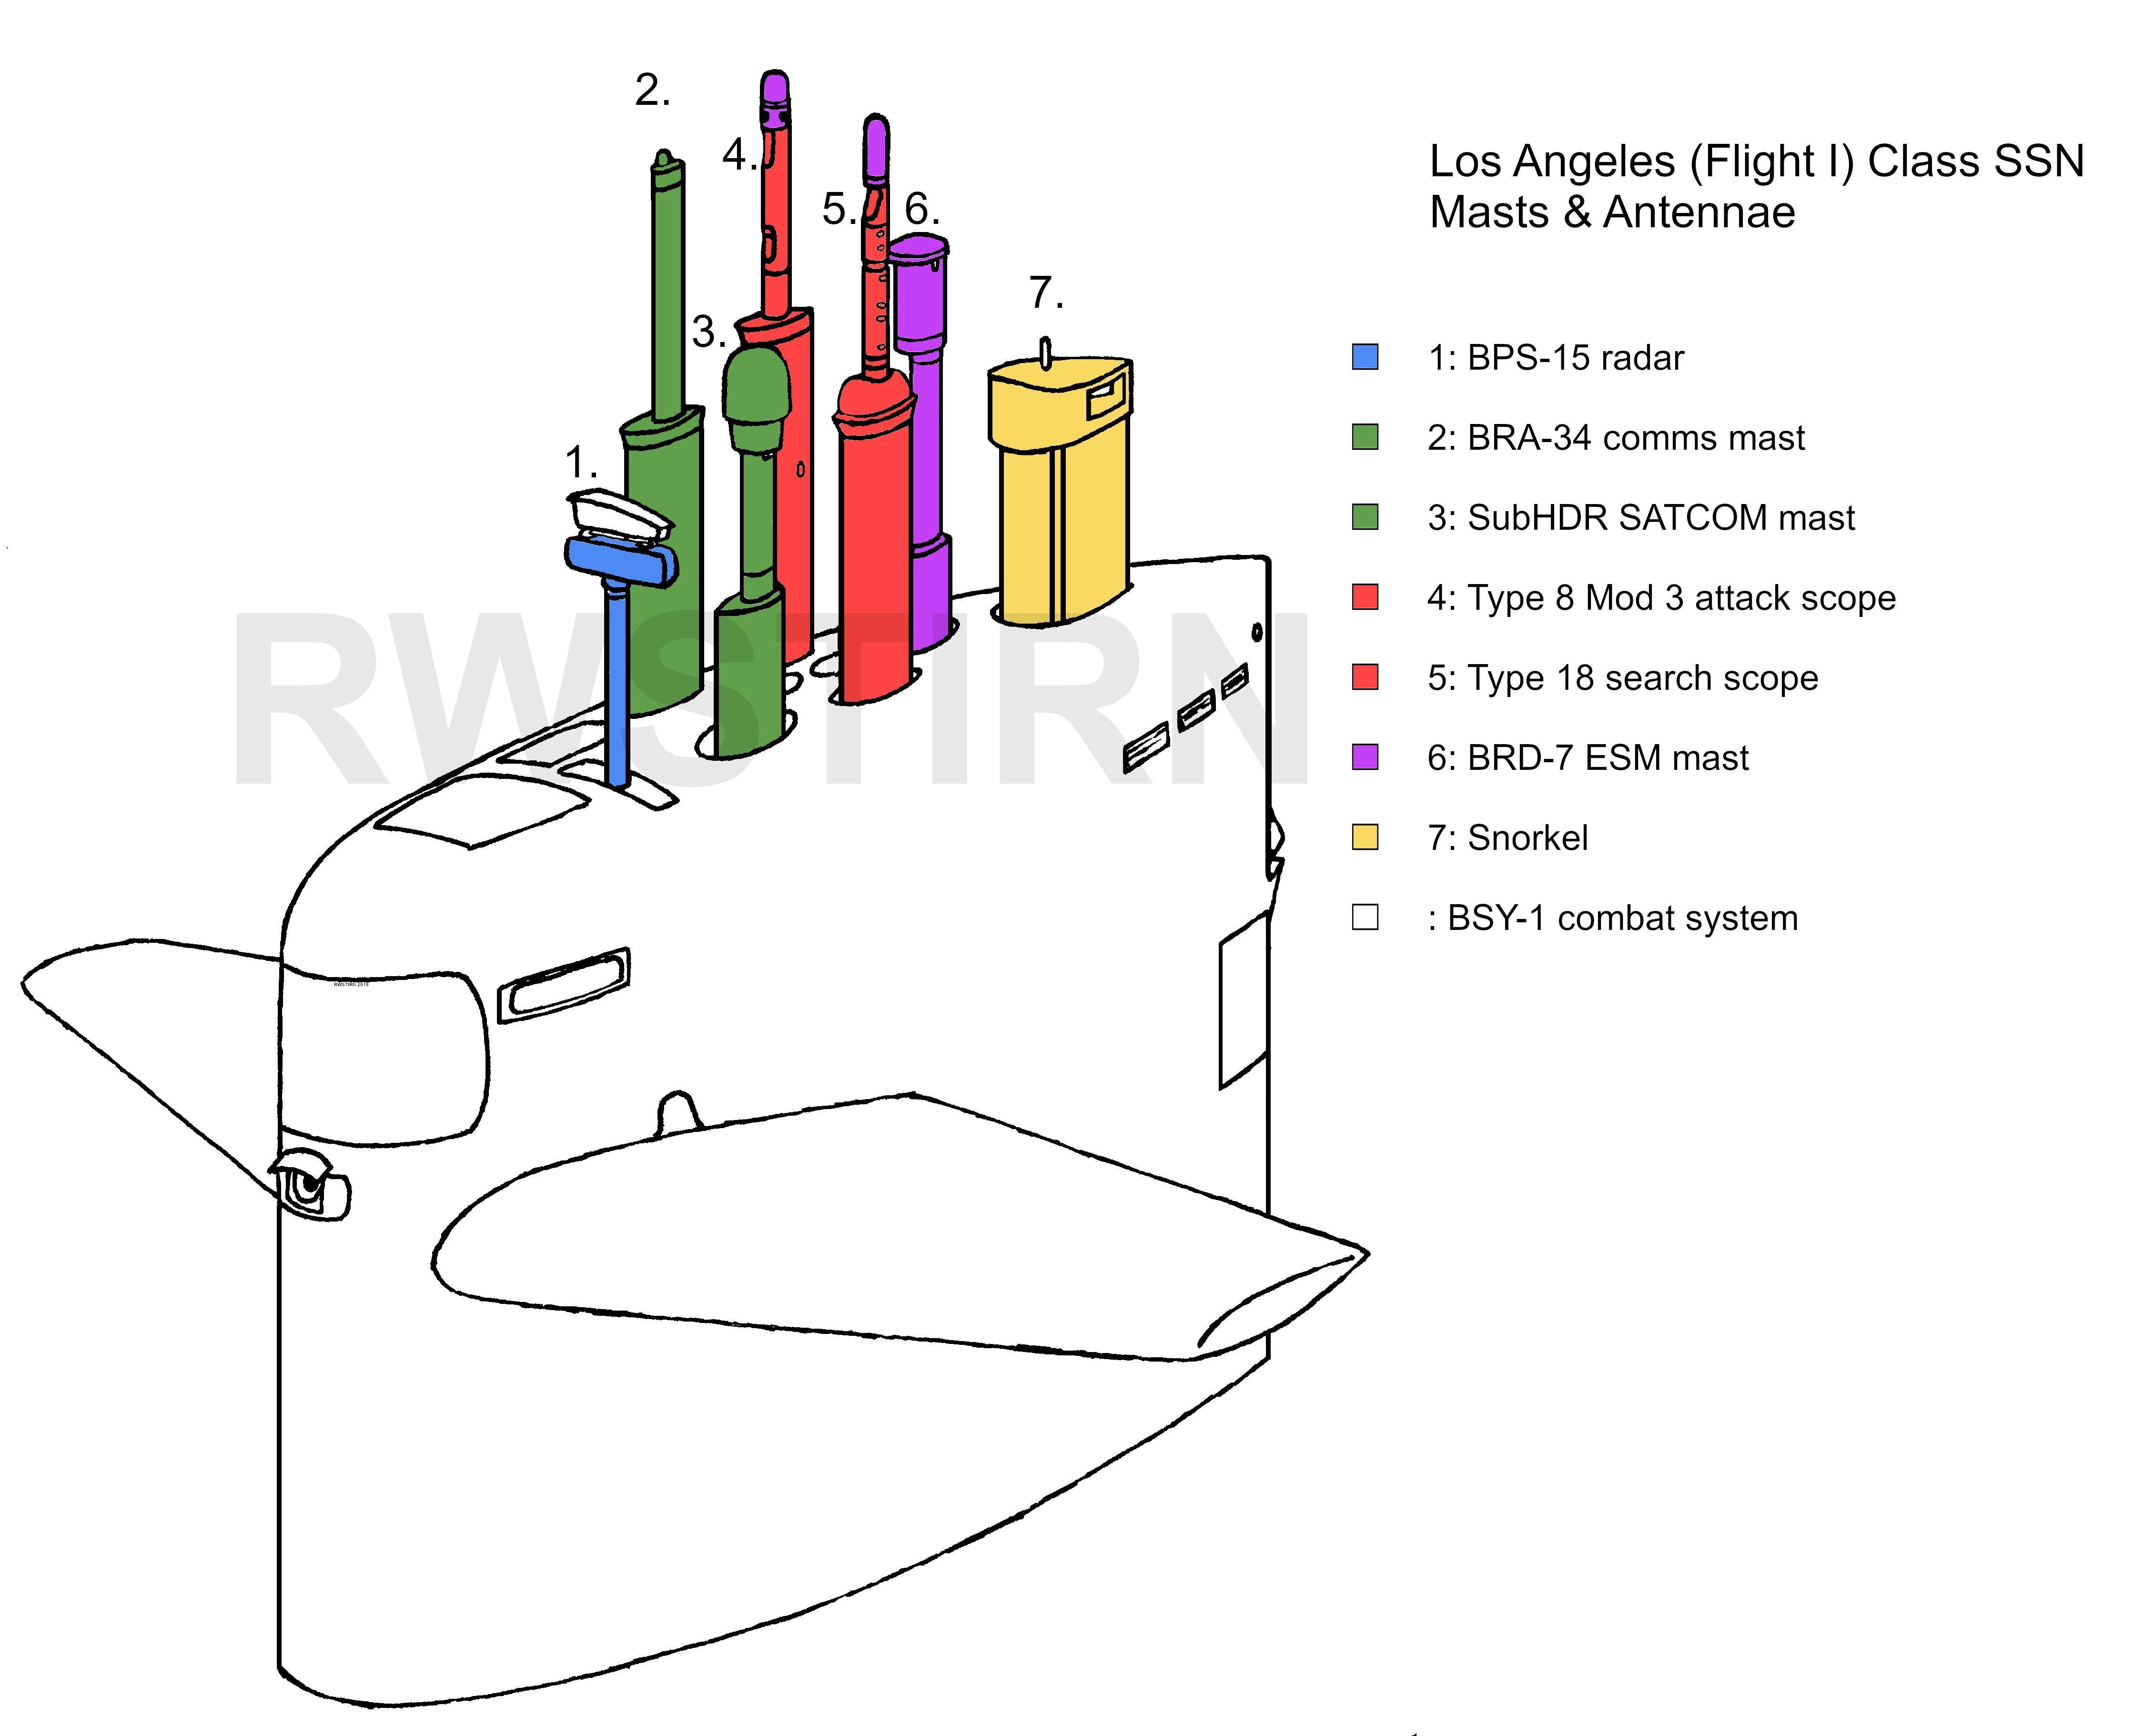 Los Angeles Class Flight I Sail Info By Richard Stirn Oc